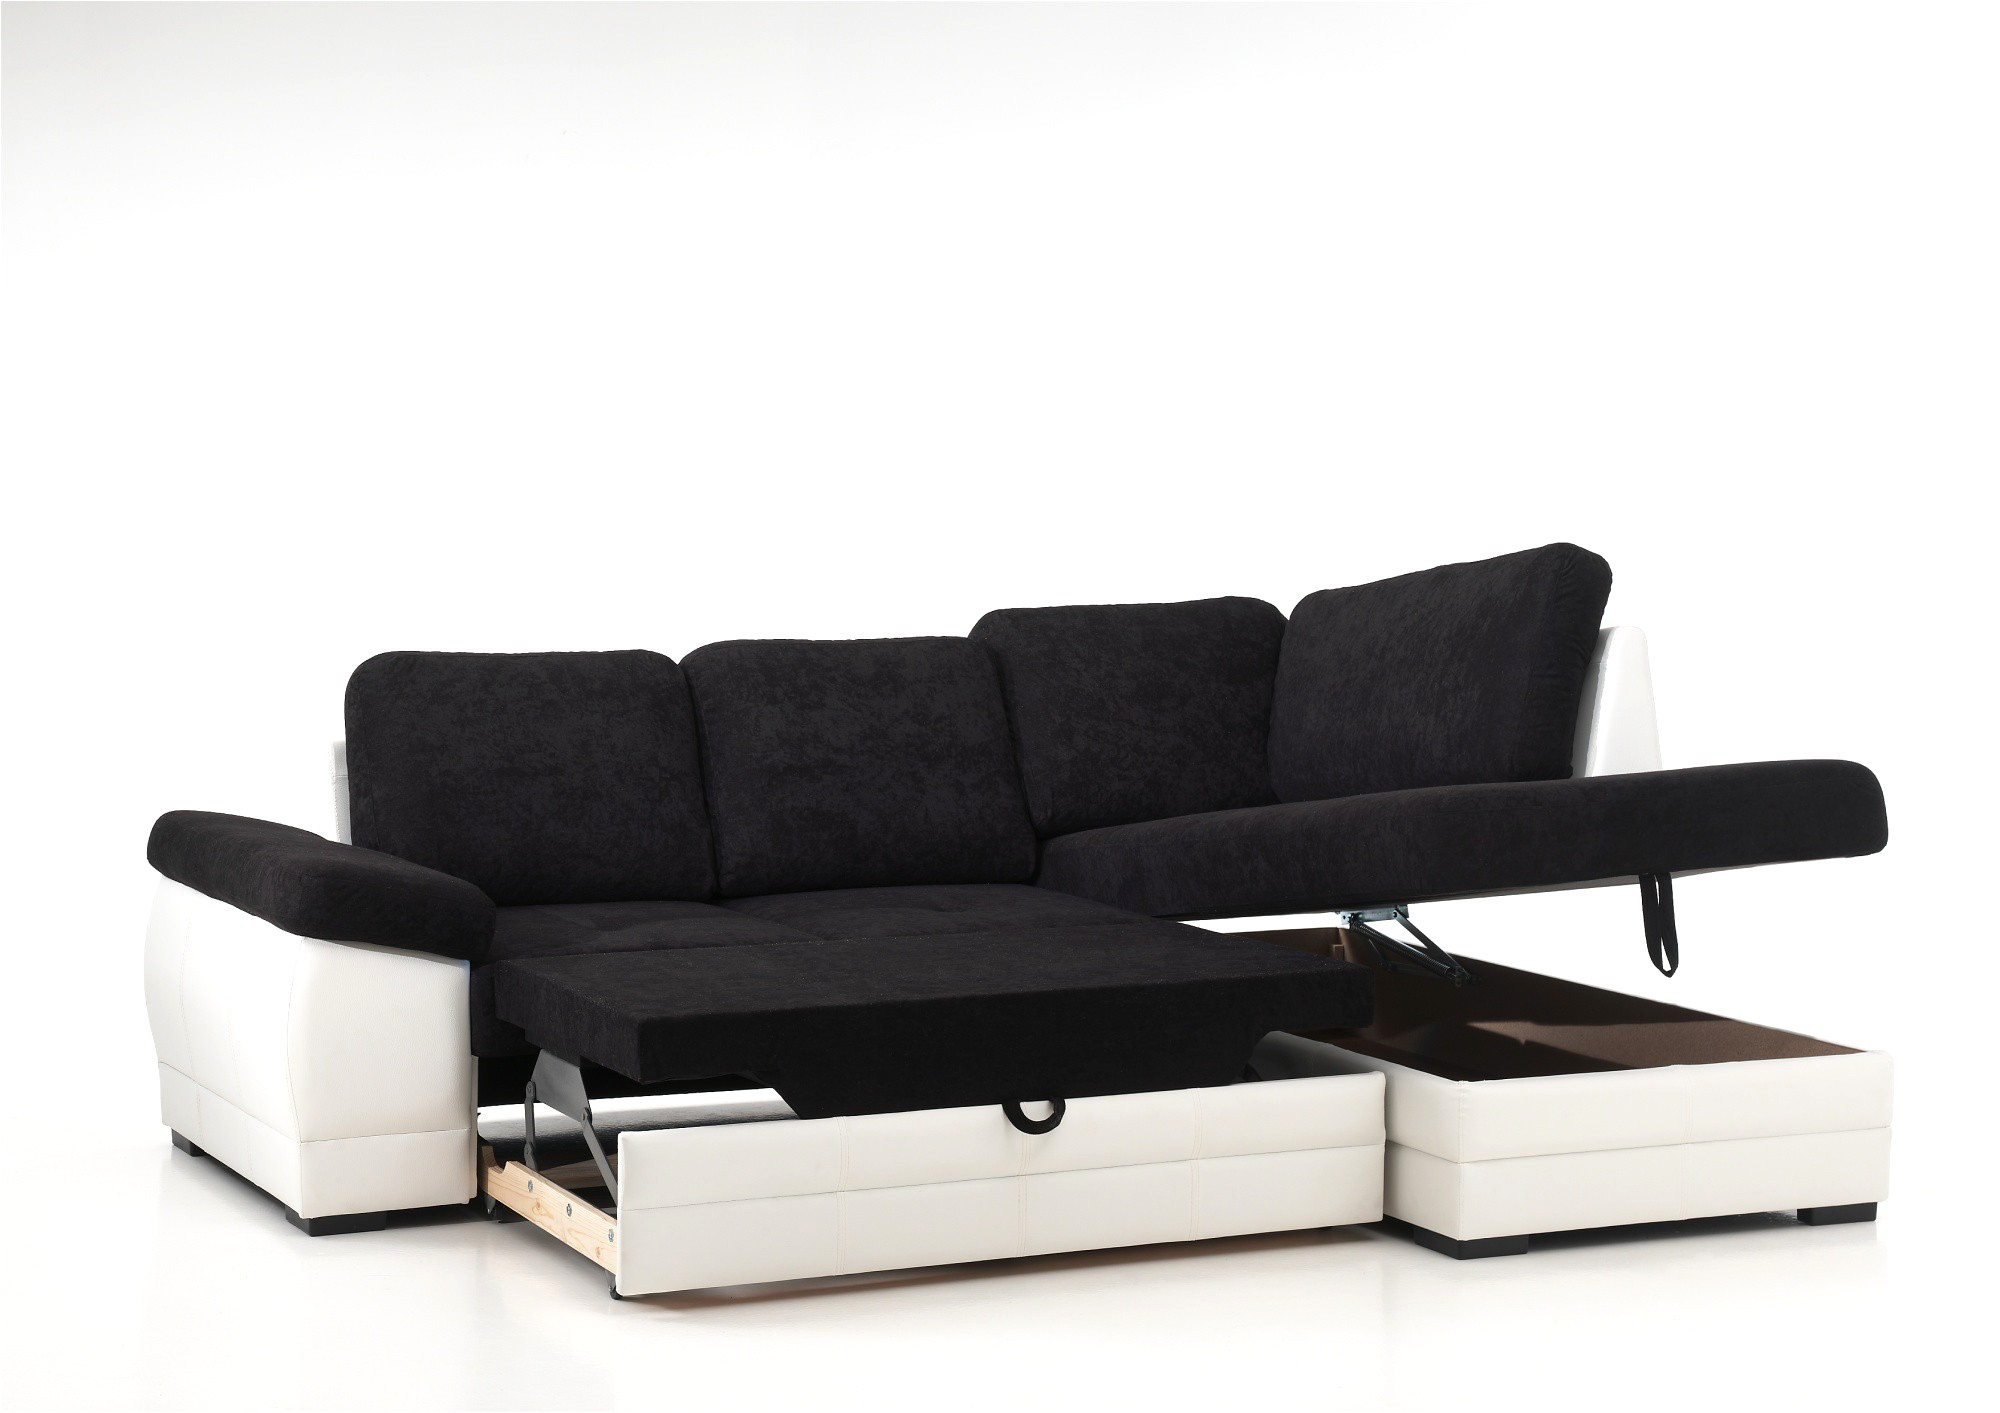 Ikea Canape Angle Convertible Unique Photos Divan Pas Cher 34